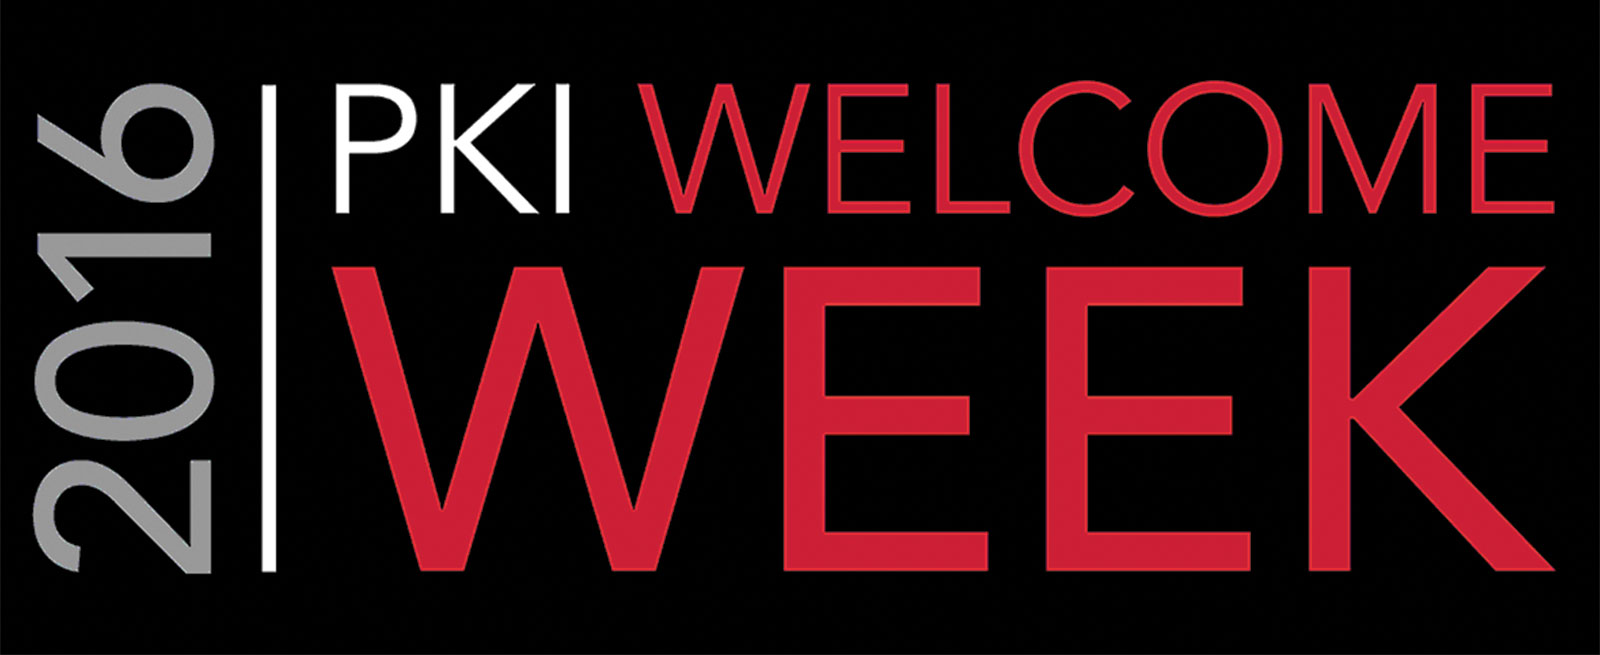 PKI Welcome Week runs Monday through Friday.